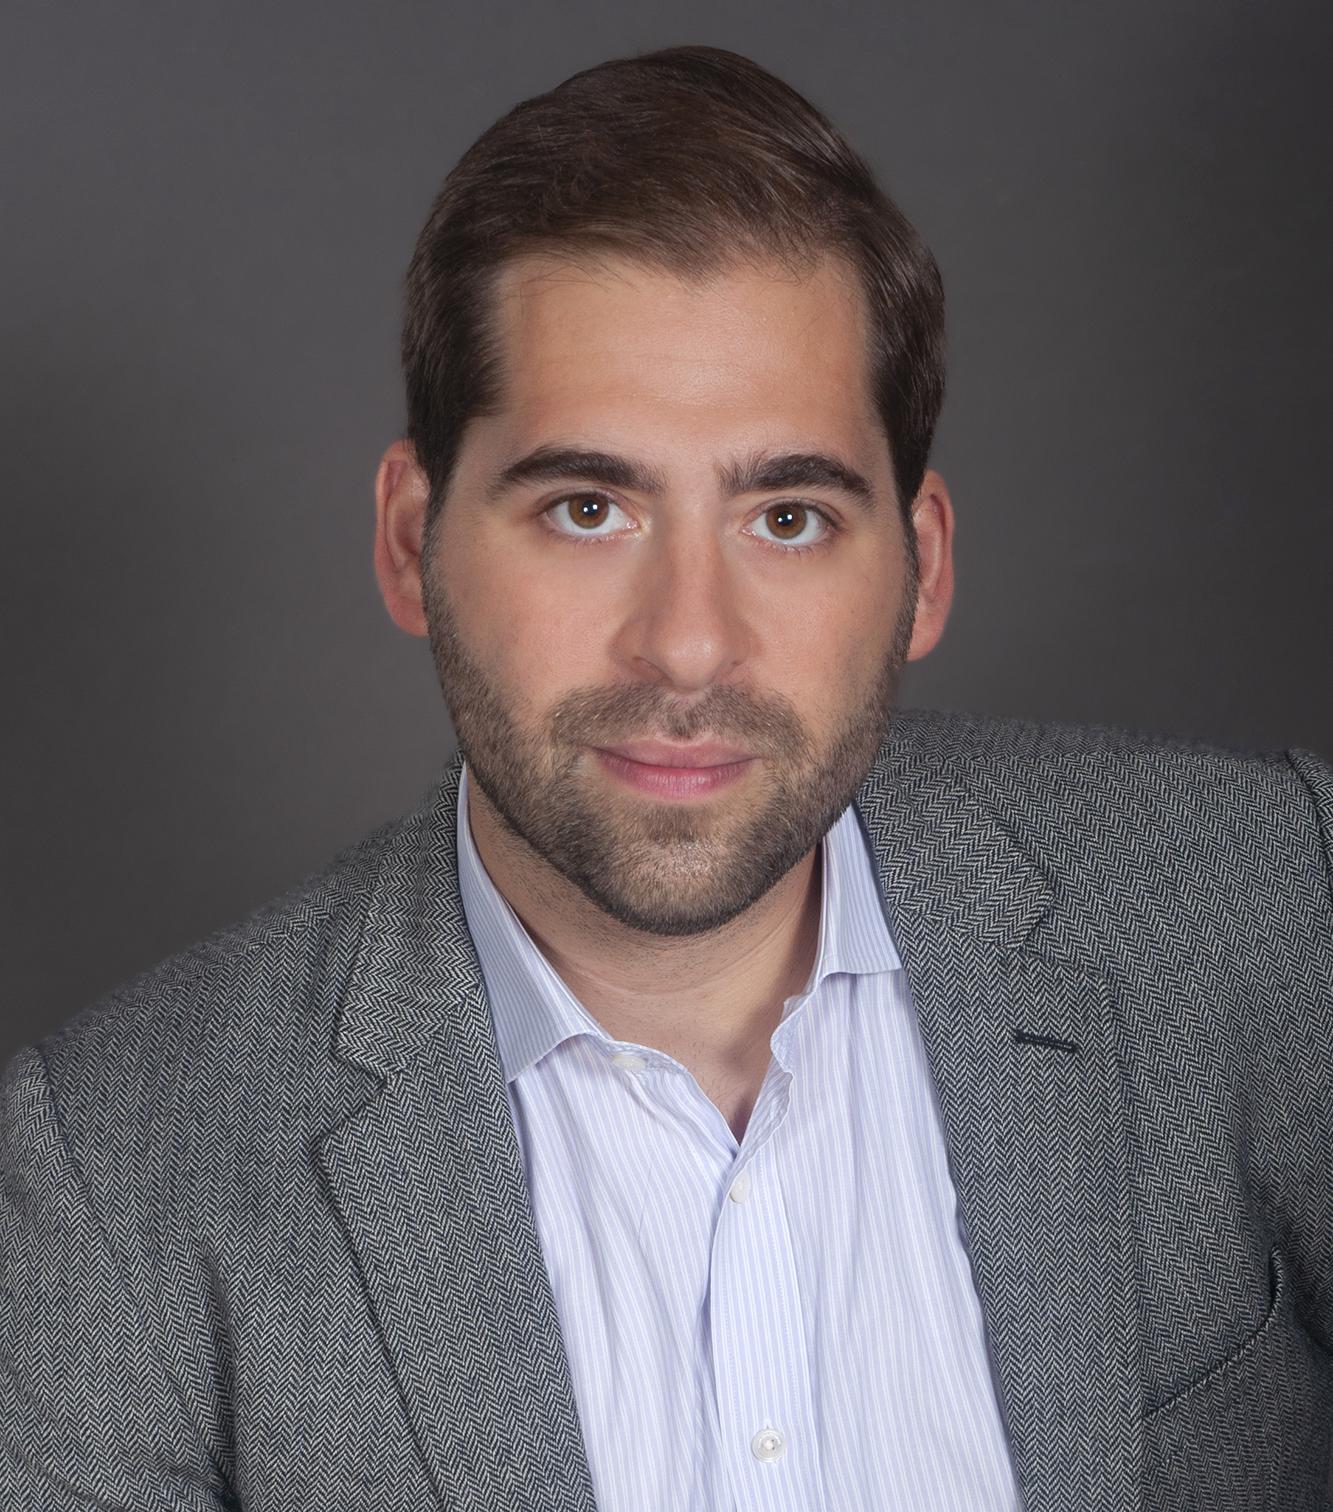 Dr Stylianos (Stelios) Kampakis